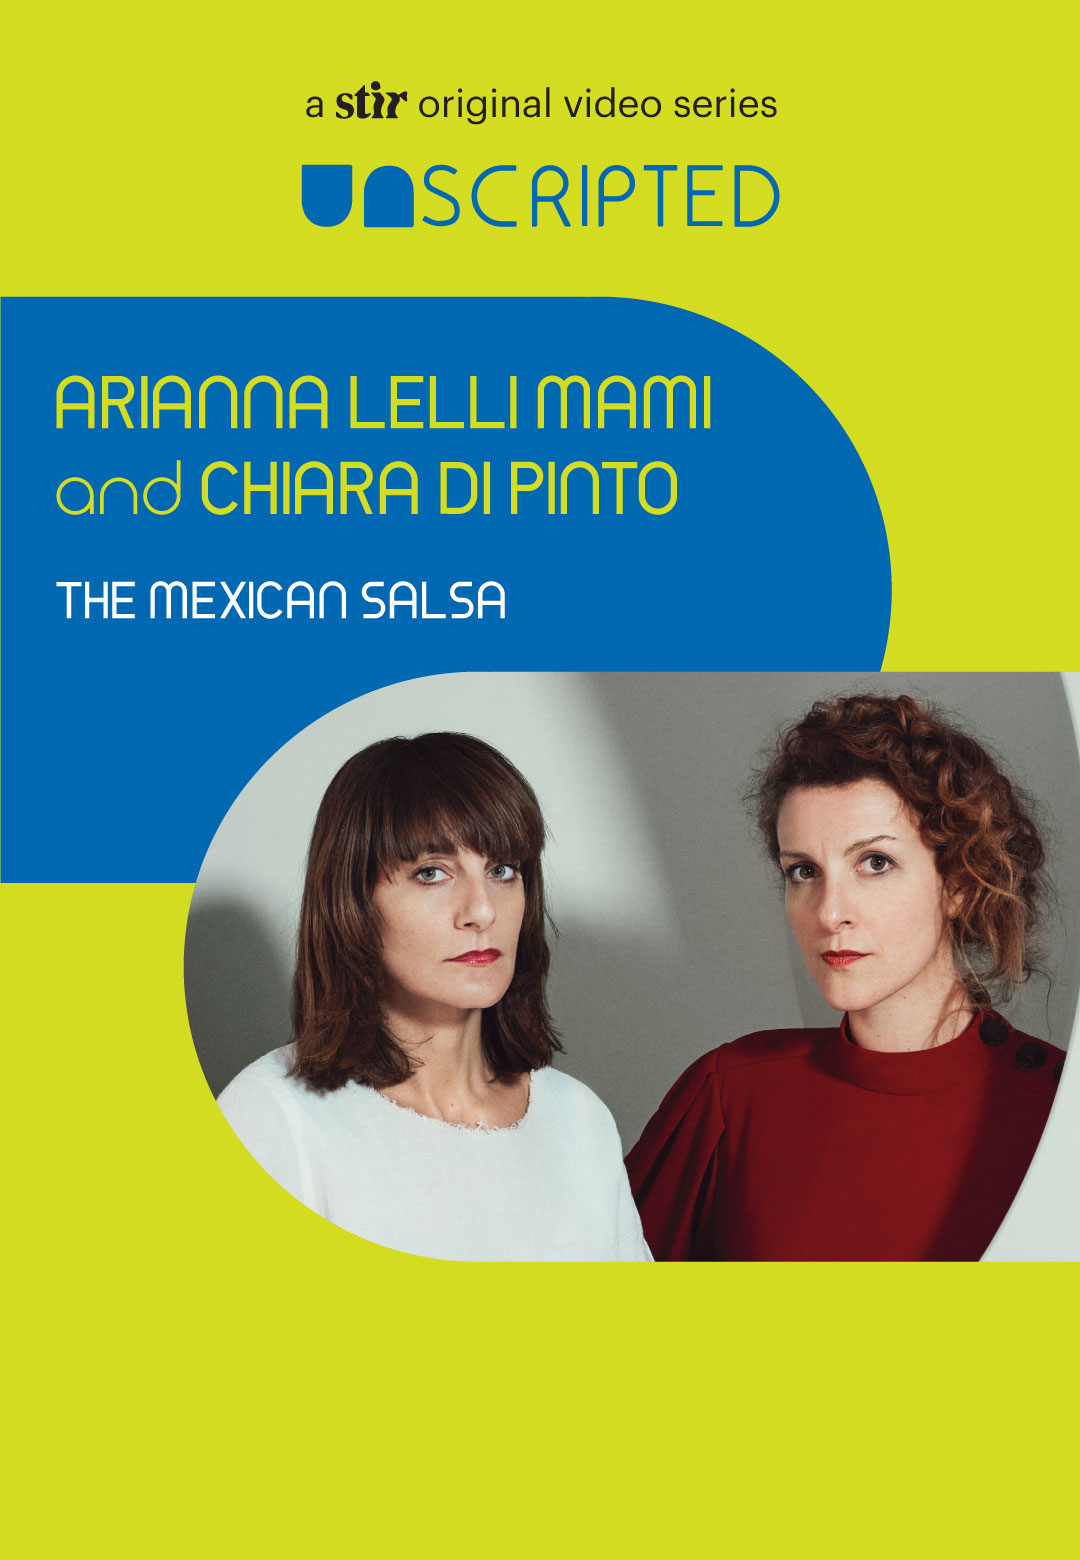 UNSCRIPTED with Arianna Lelli Mami and Chiara Di Pinto of Studiopepe | Studiopepe | UNSCRIPTED | STIRworld